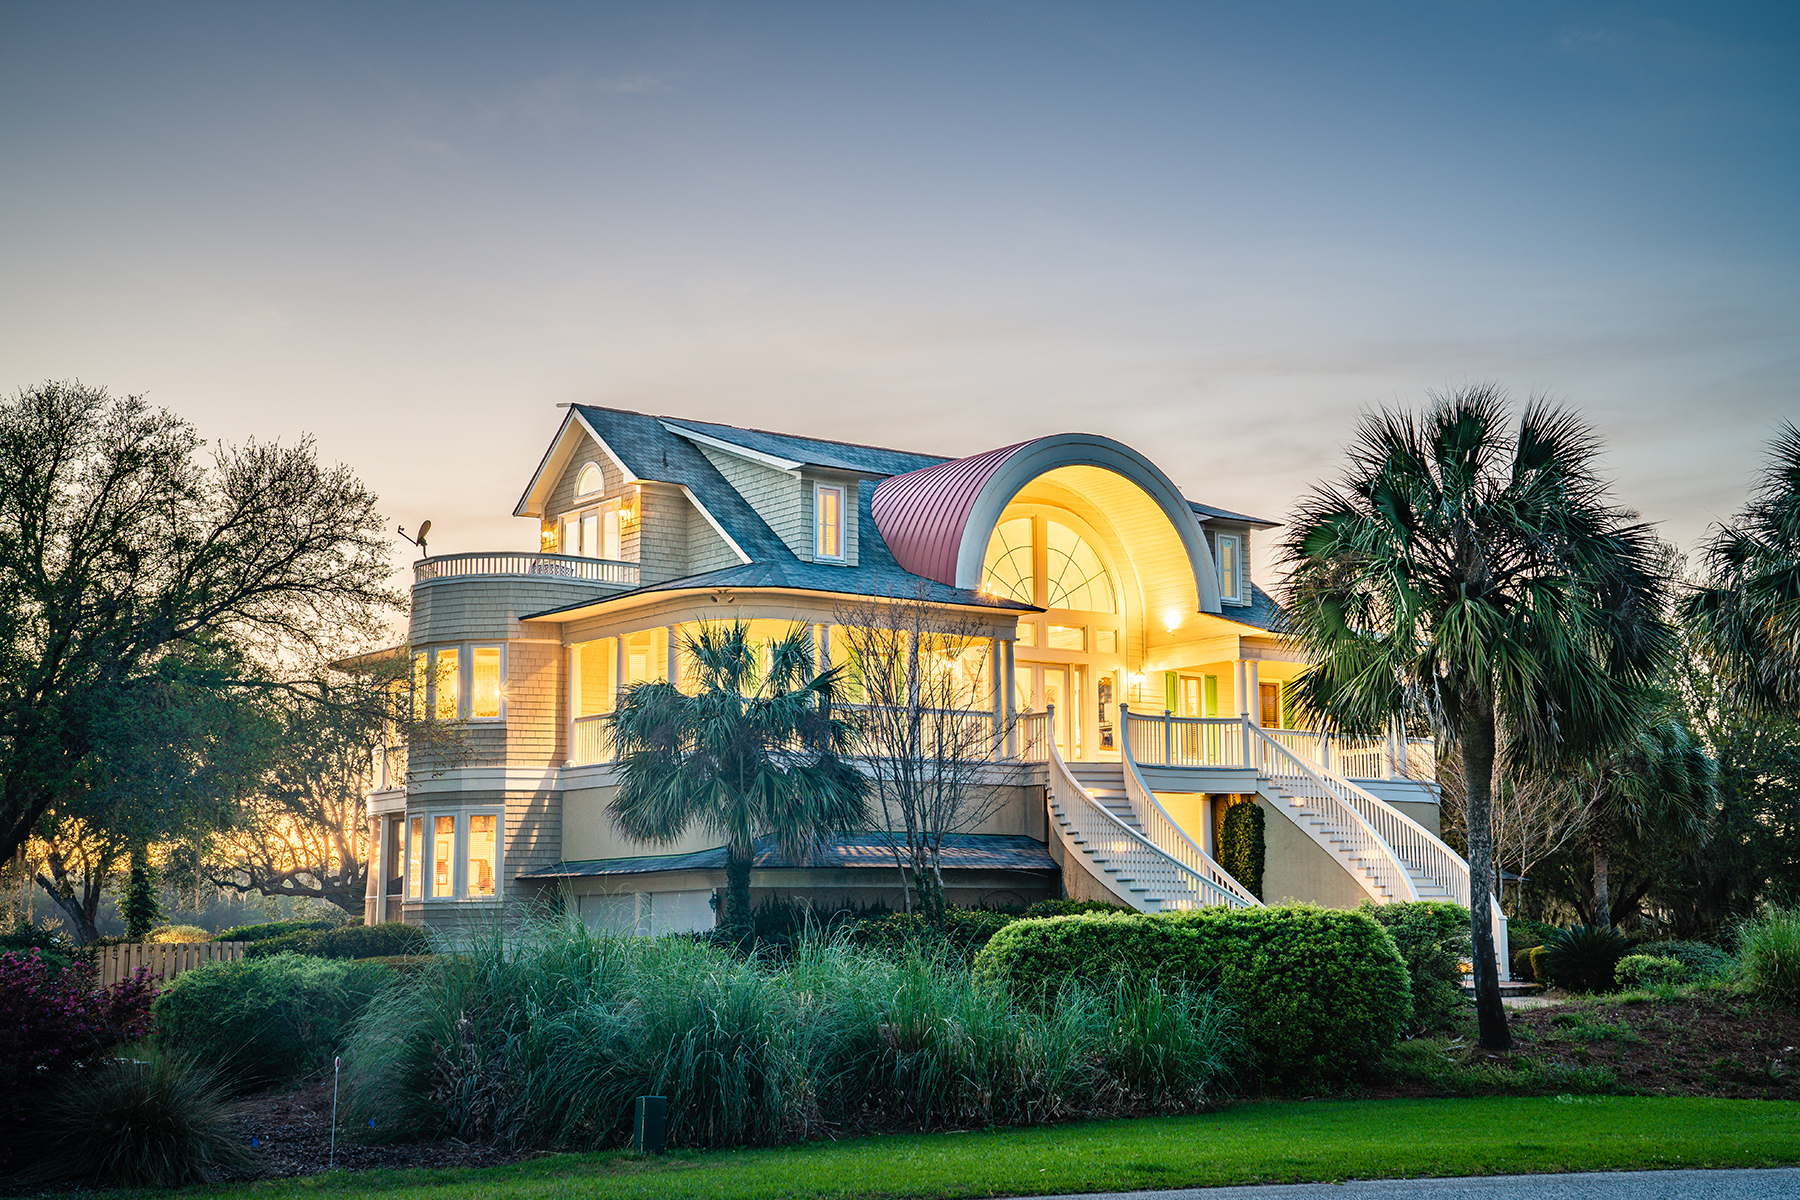 Single Family Homes for Active at 3960 Gift Boulevard Johns Island, South Carolina 29455 United States